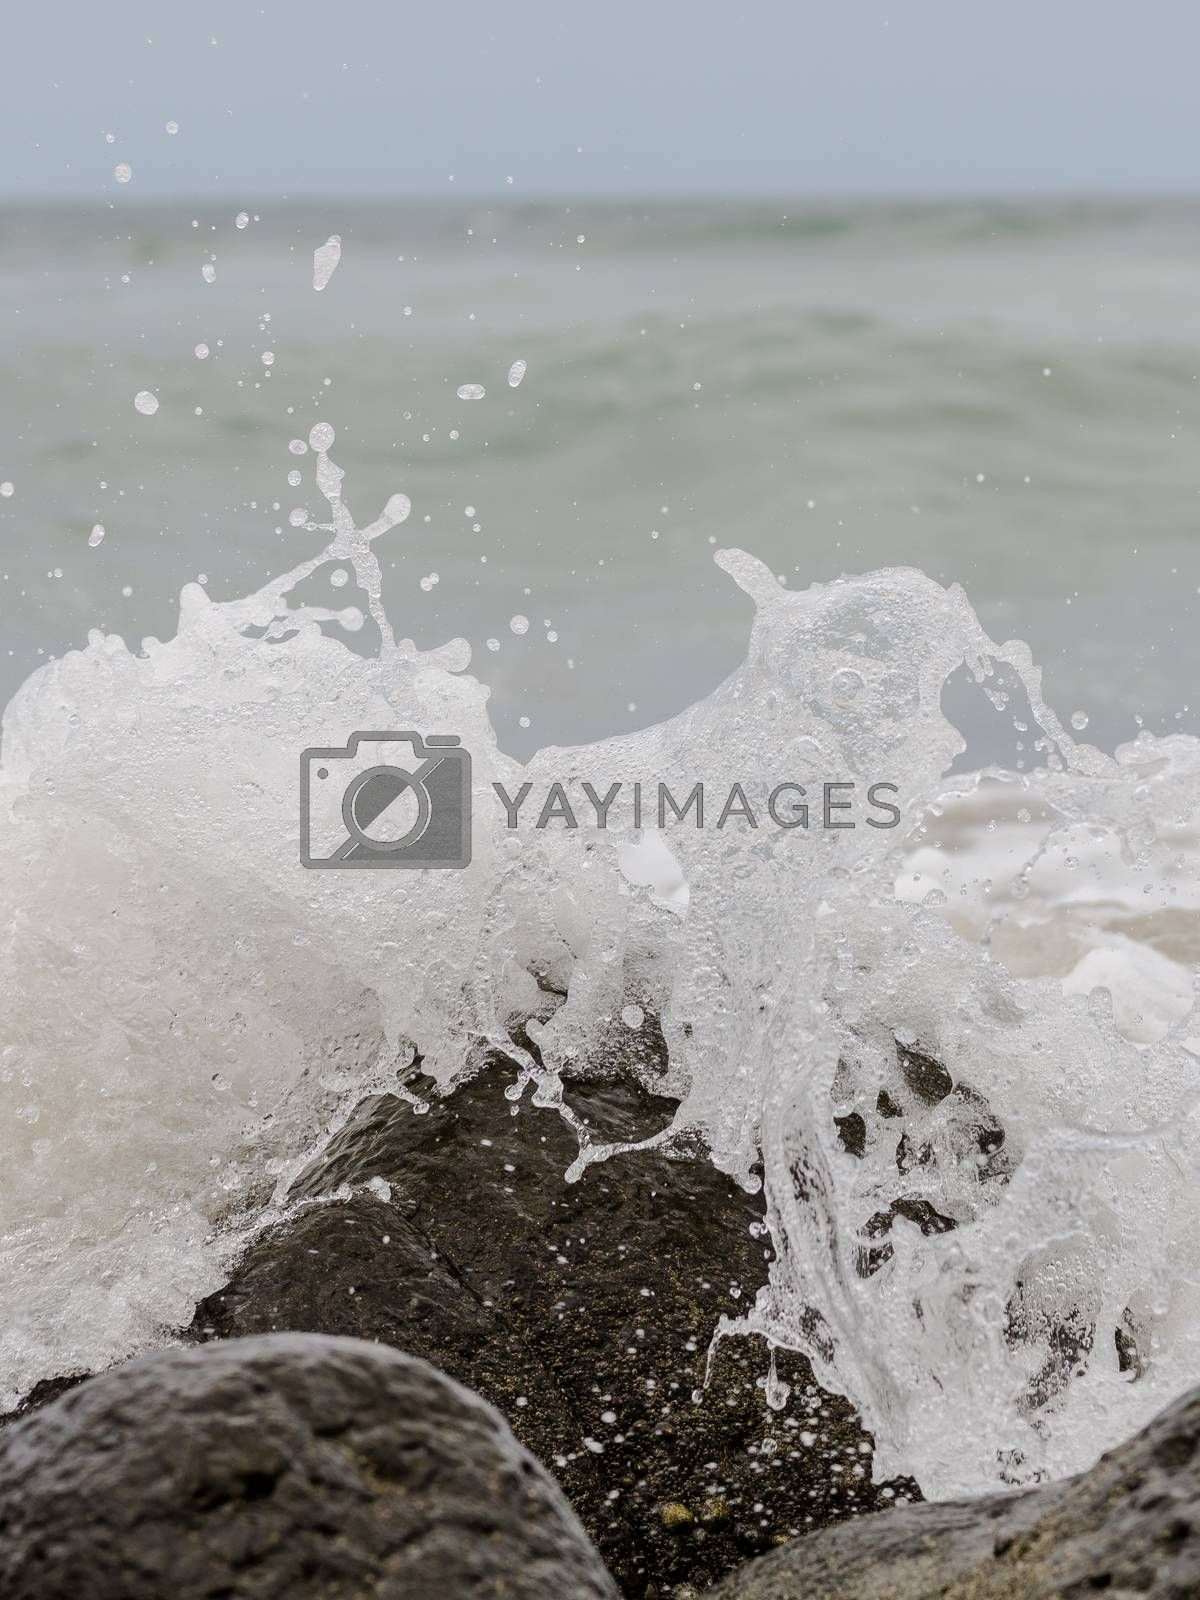 Royalty free image of Atlantic Ocean Waves by derejeb